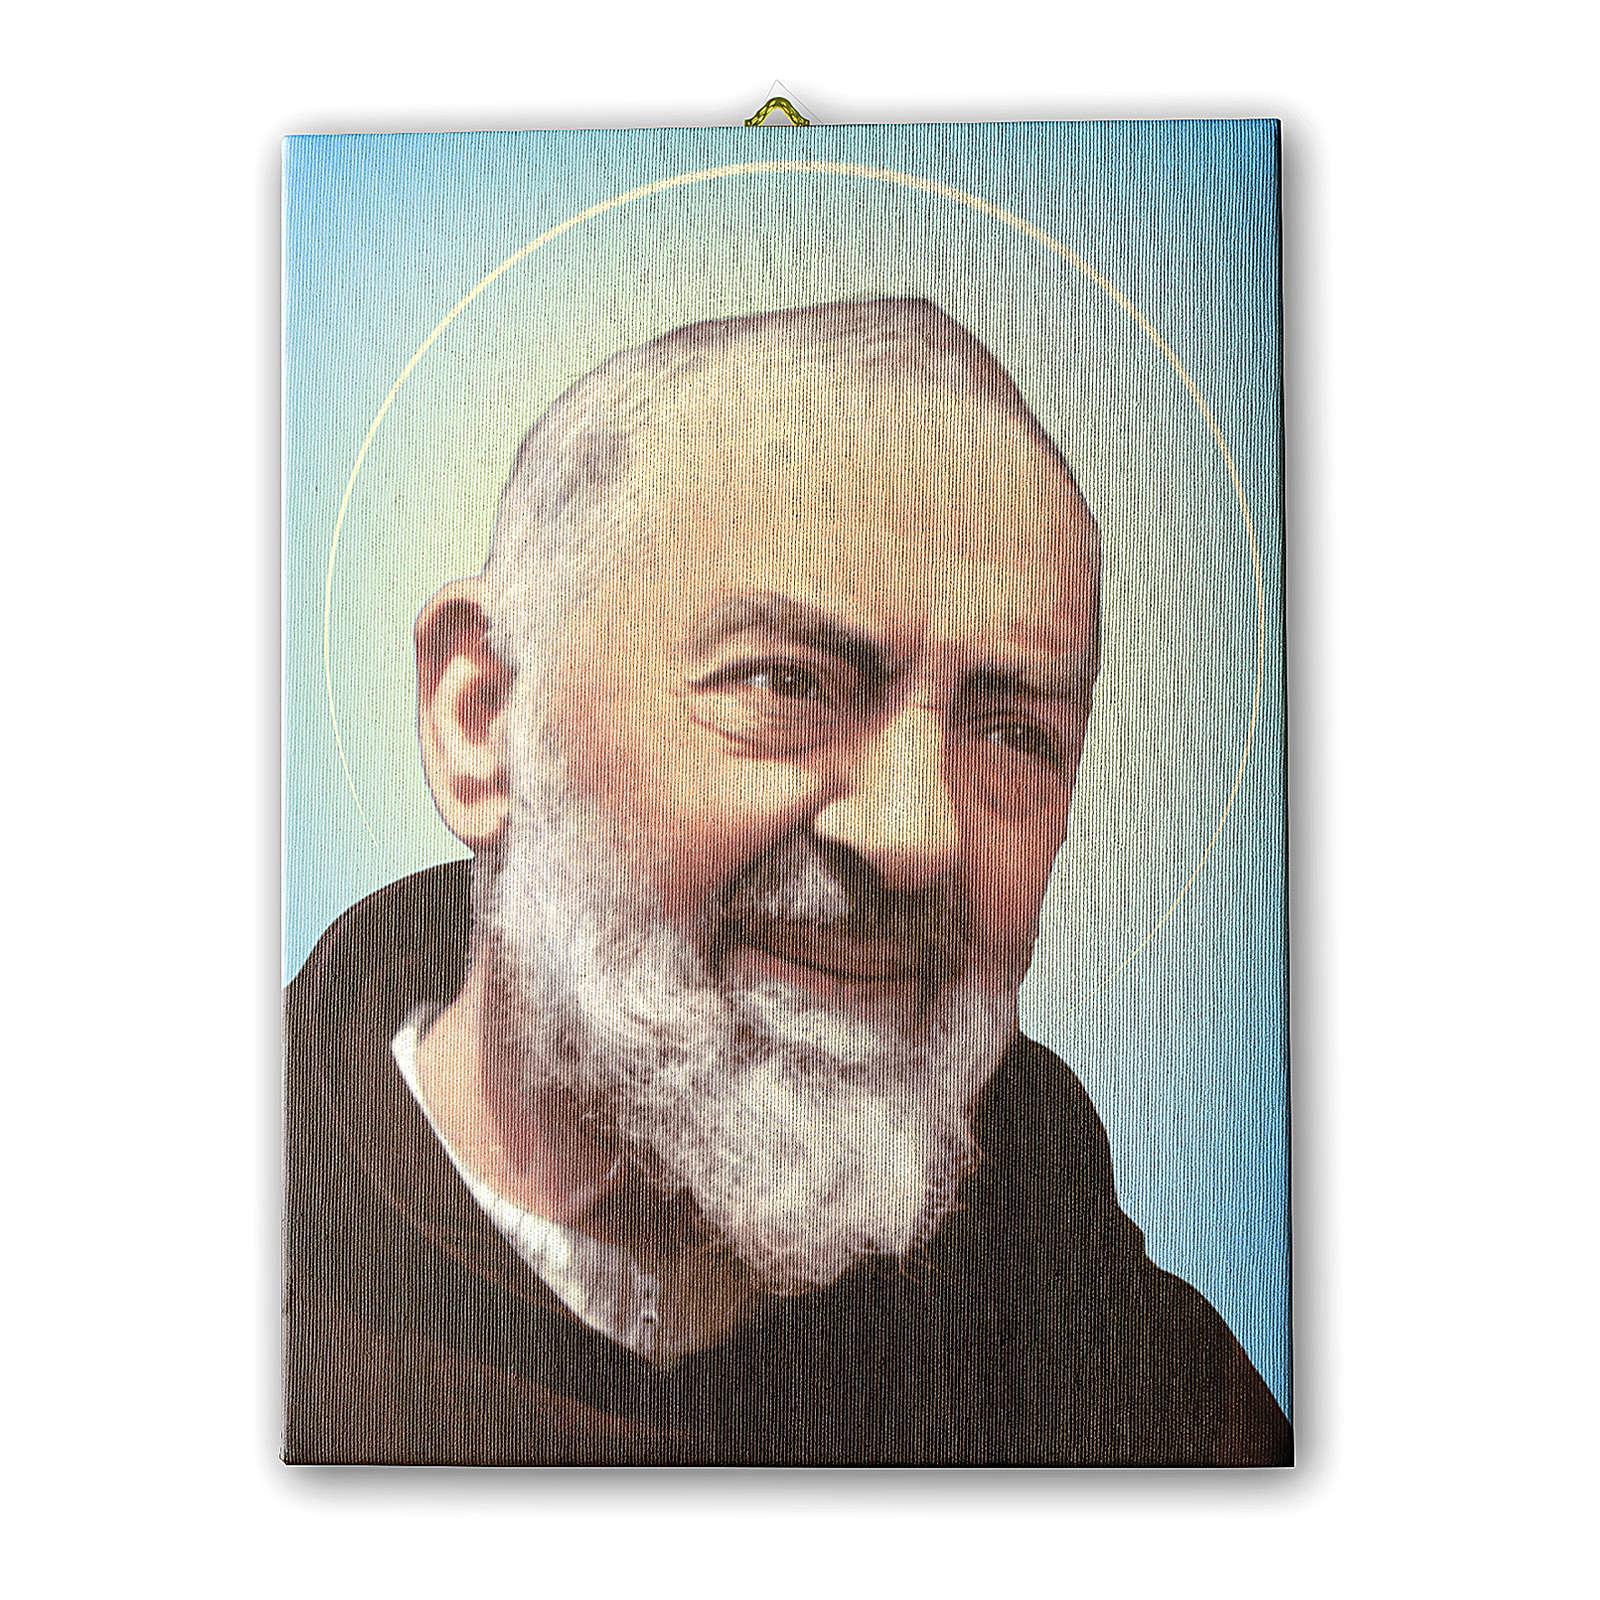 Cadre sur toile Padre Pio 40x30 cm 3